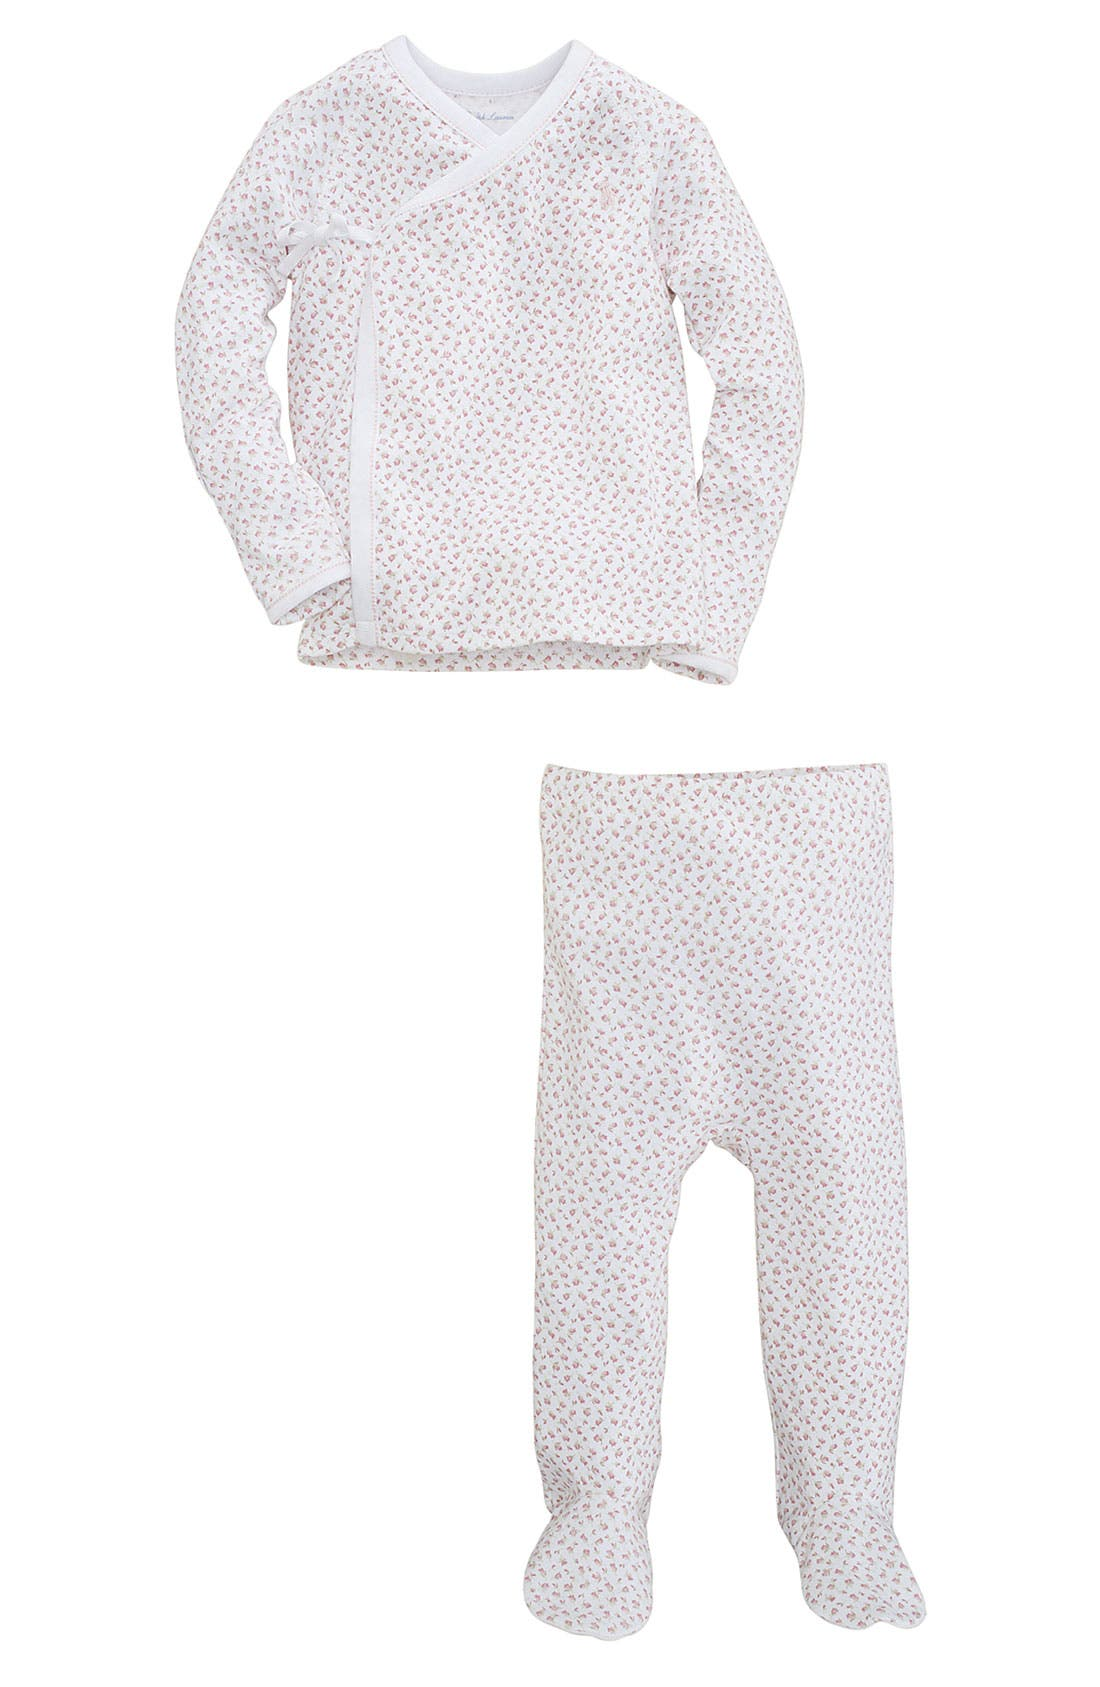 Alternate Image 2  - Ralph Lauren Print Top & Footed Pants Set (Baby)